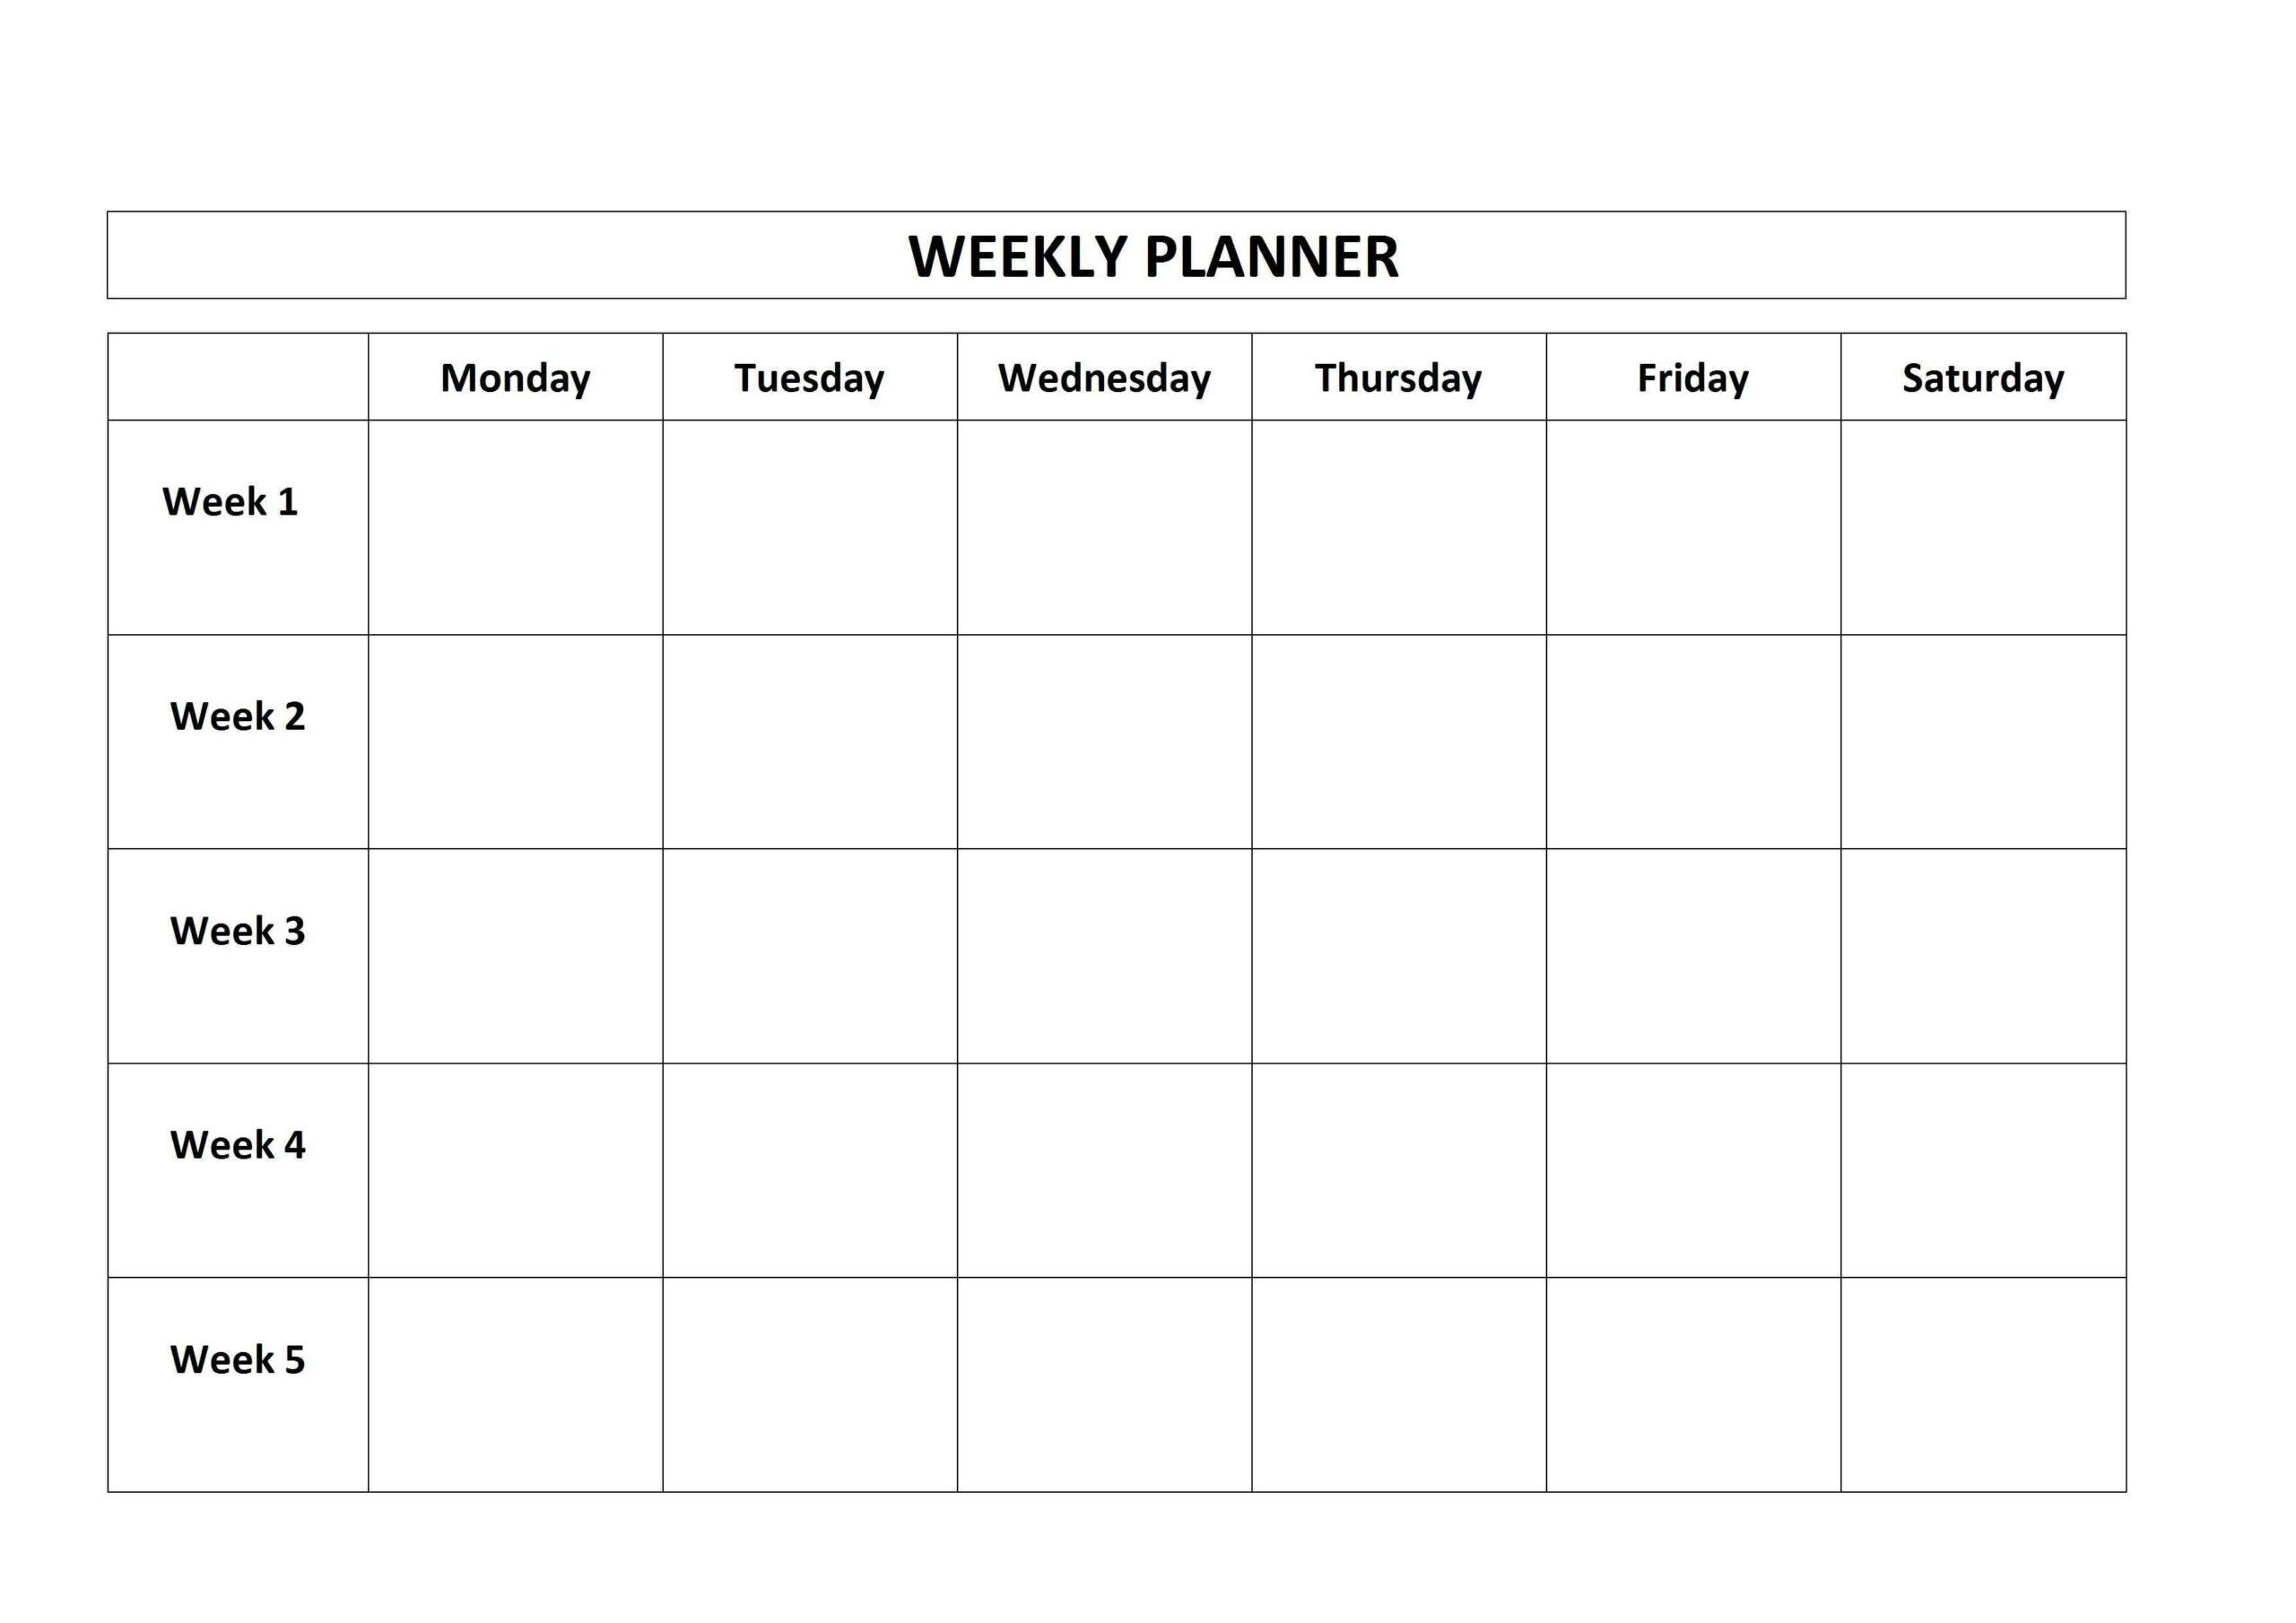 Template Monday To Friday | Calendar Template Printable